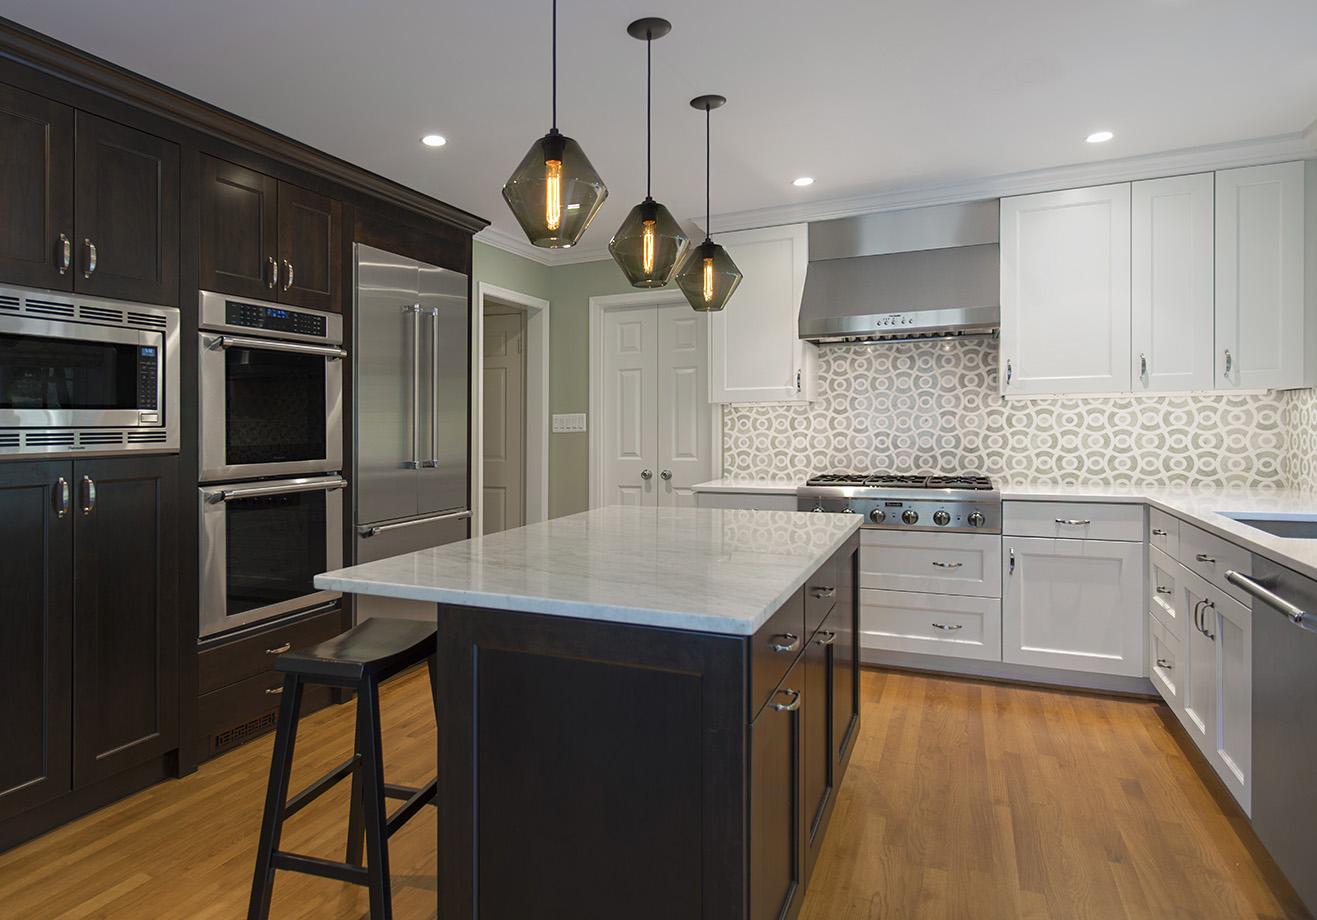 Kitchen renovation with island